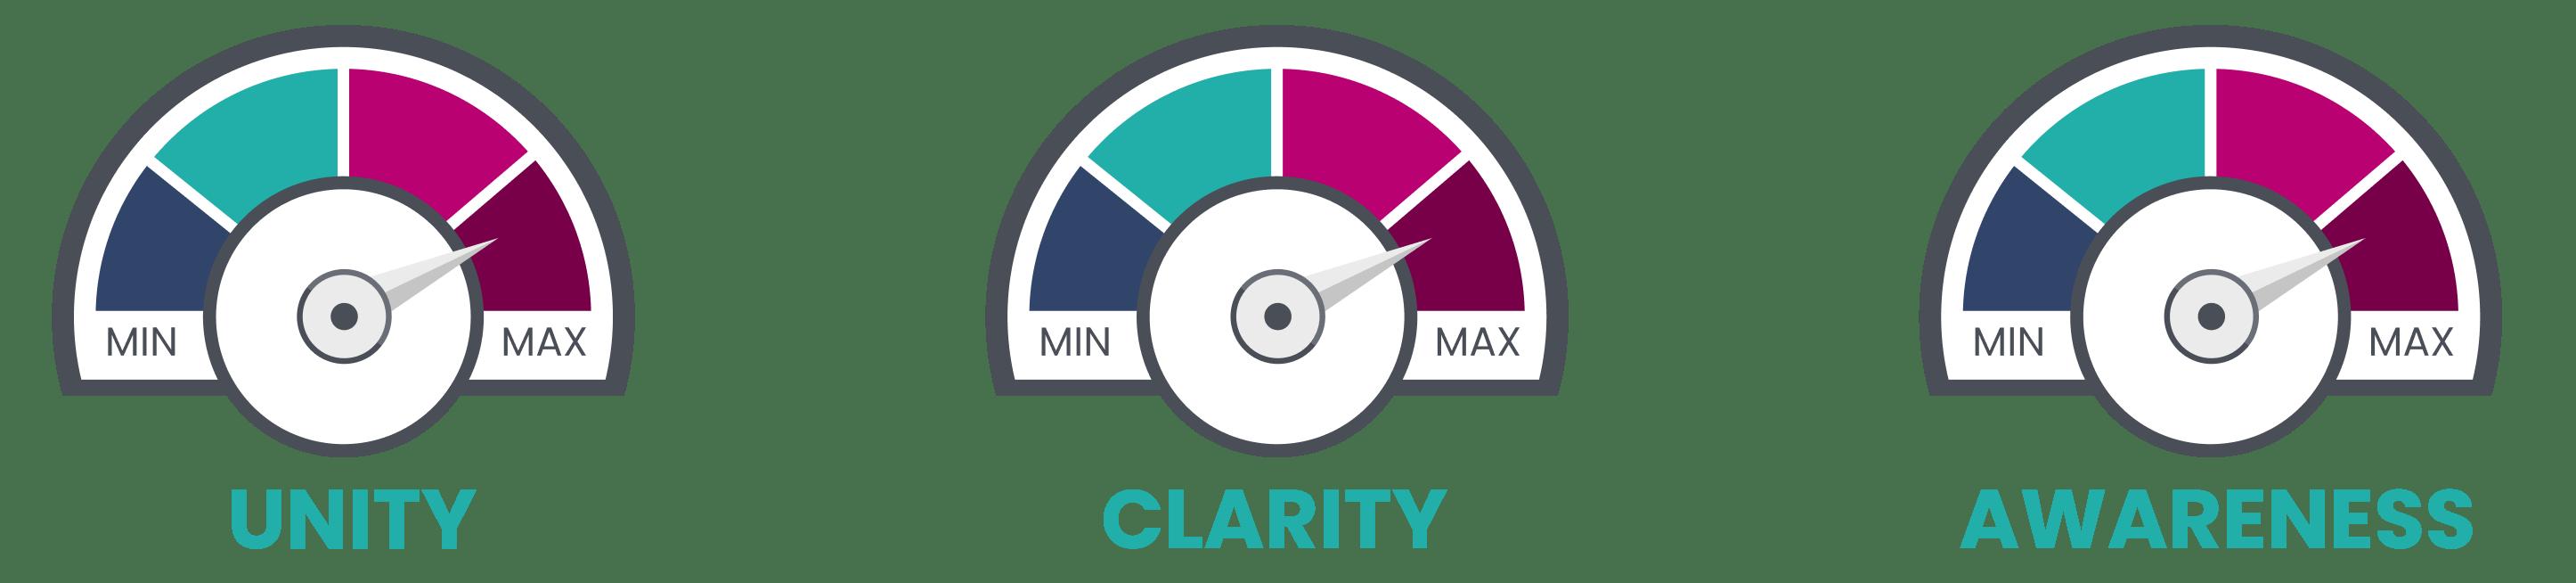 Unite-LoToTo max performance